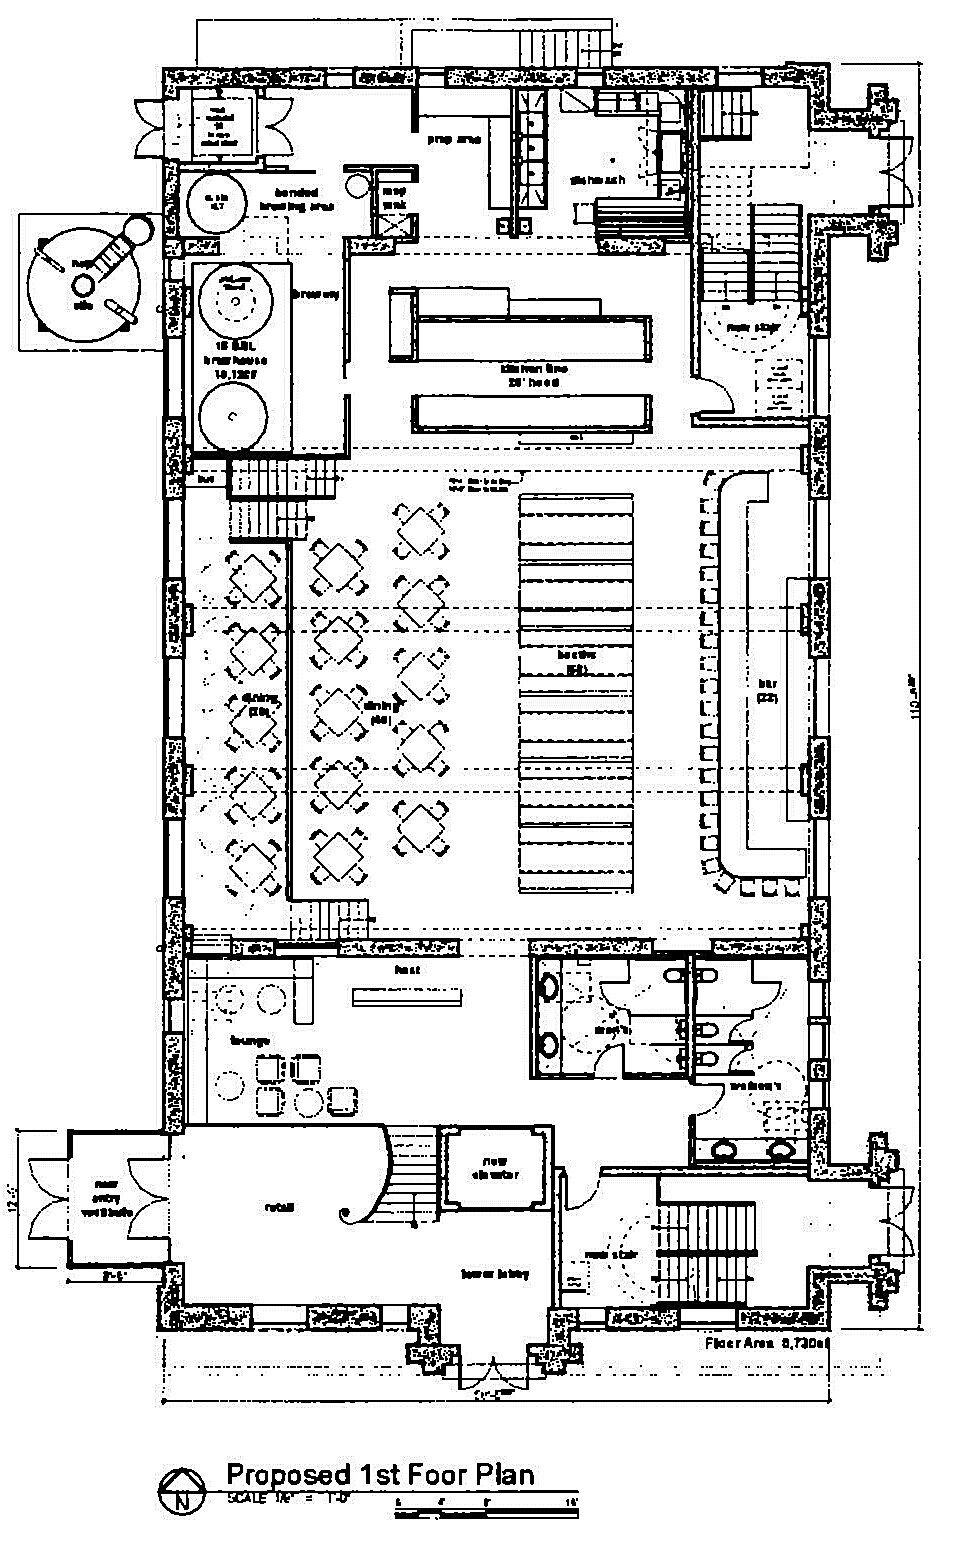 Blueprints eris brewery and cider house gdb projects to try blueprints eris brewery and cider house gdb malvernweather Choice Image